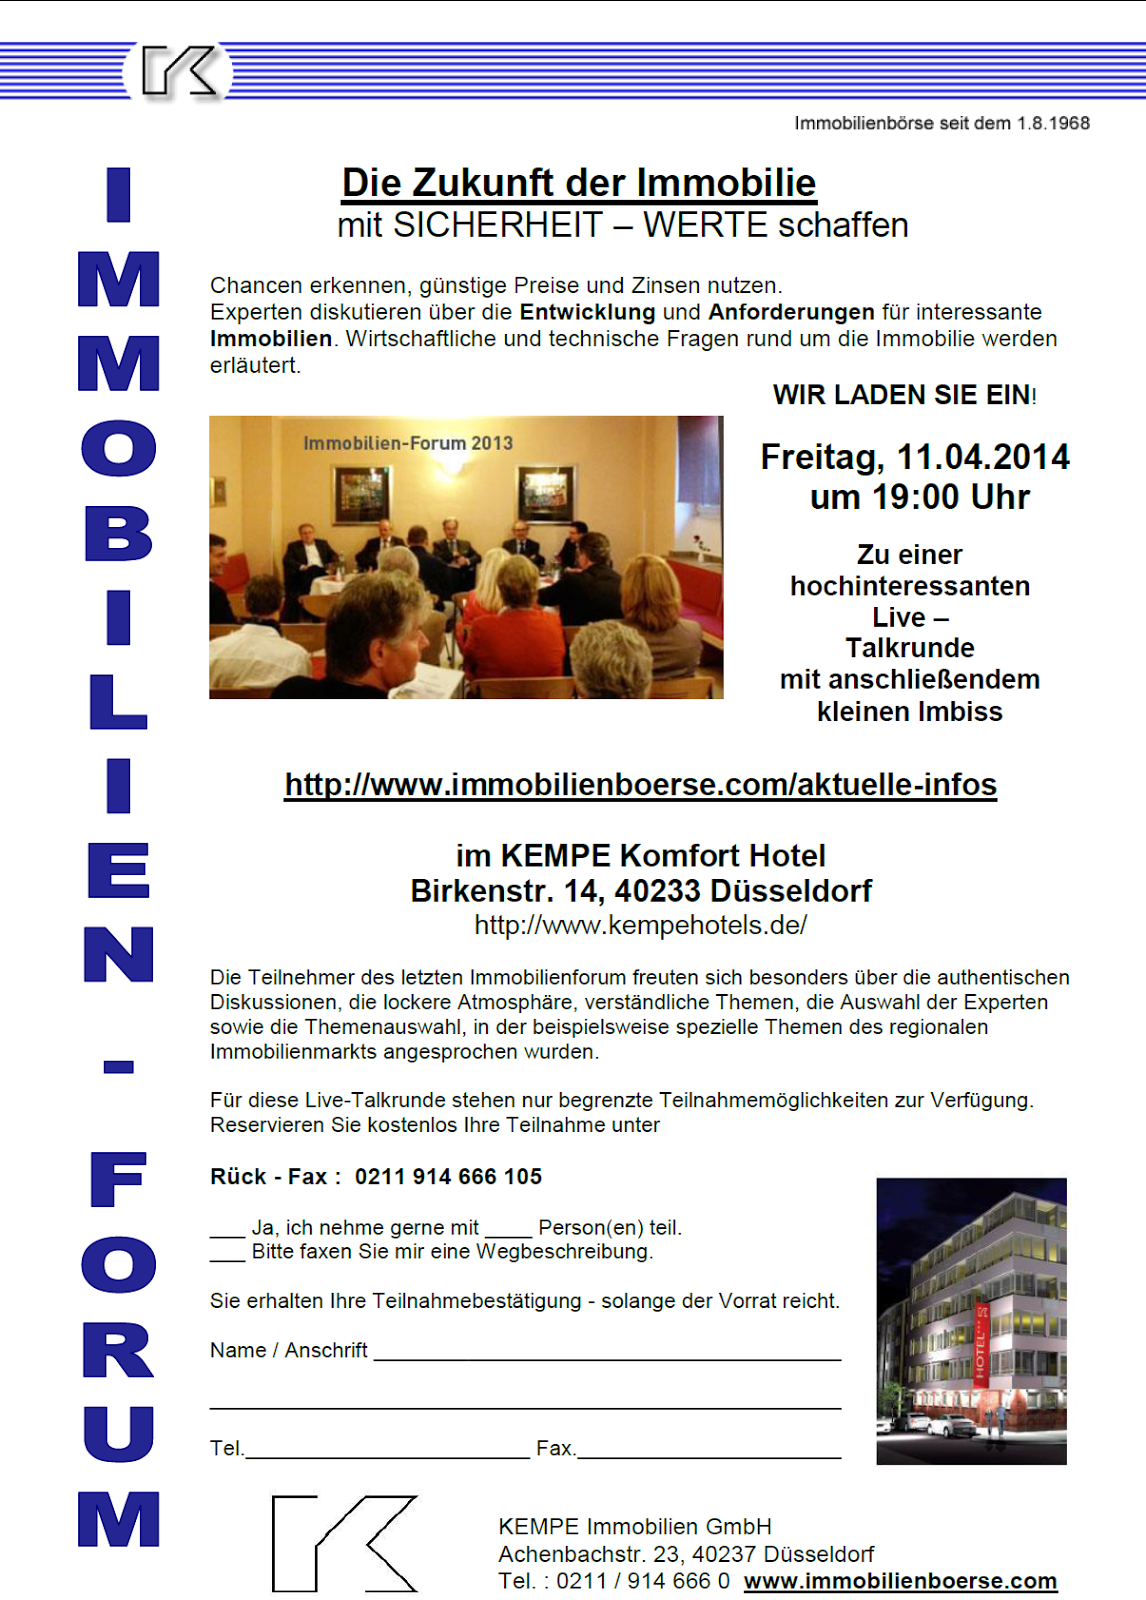 http://www.immobilienboerse.com/aktuelle-infos/immobilien-forum-april-2013